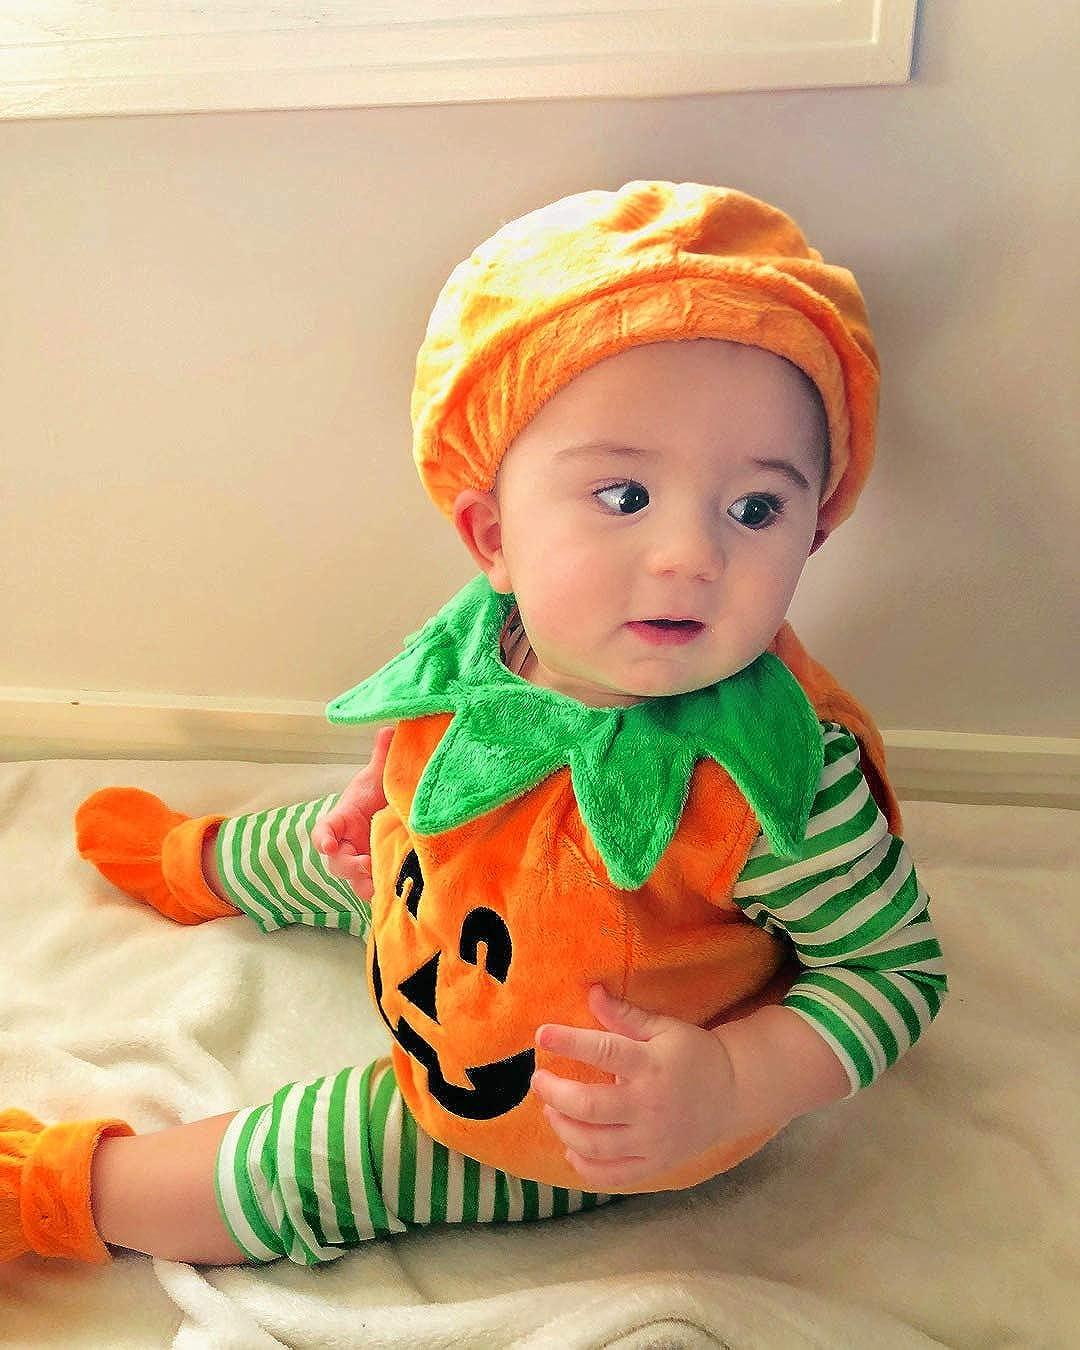 VISGOGO Baby Boy Girl Halloween Pumpkin Romper Bodysuit+Hat+Shoes 3PCS Outfit Costumes